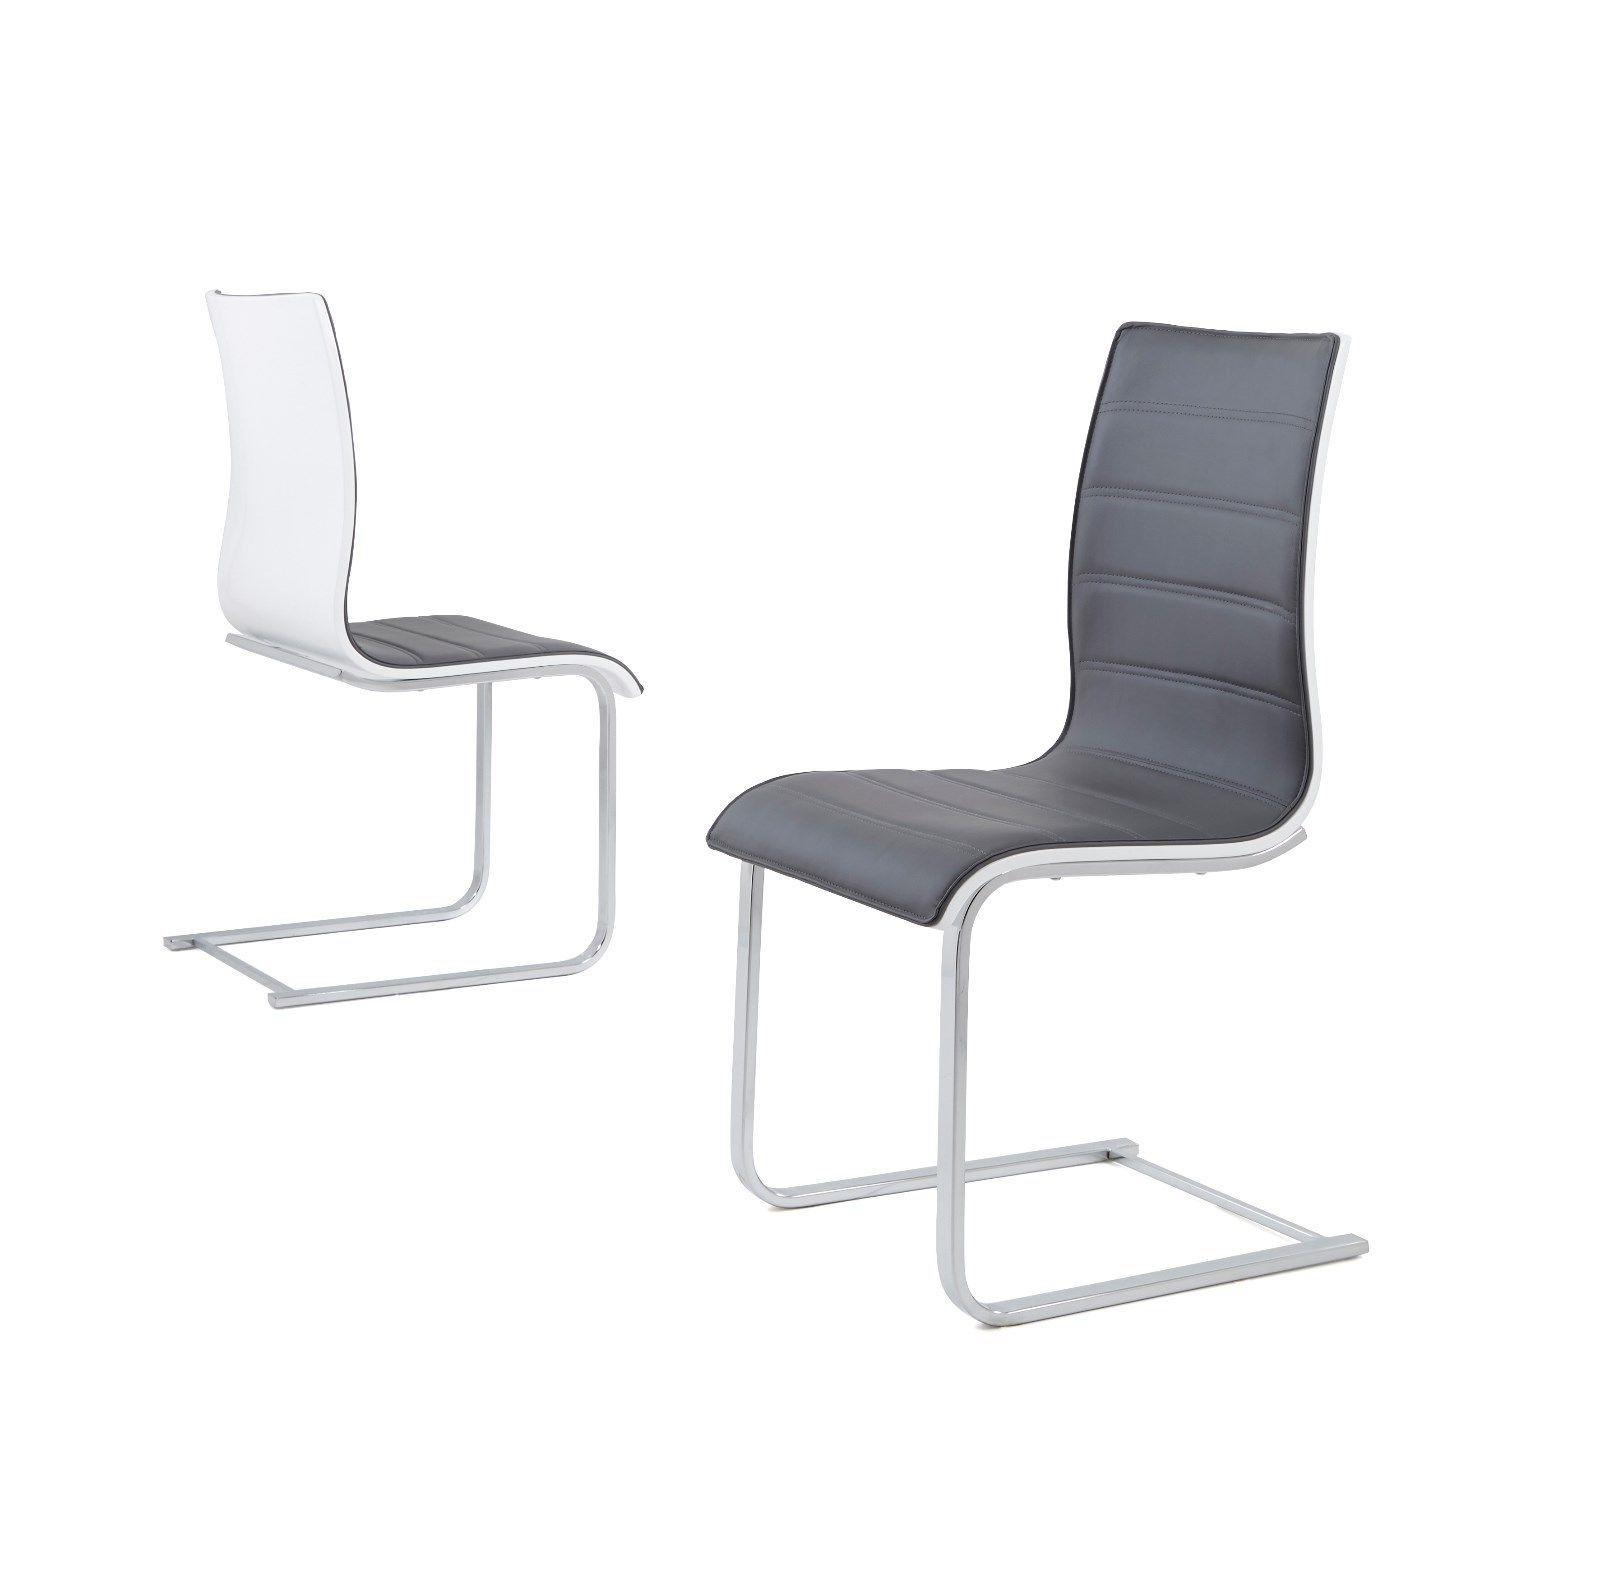 High Gloss Dining Chairs Regarding Newest Wynn High Gloss Back Dining Chairs Only – Grey & White (Gallery 11 of 25)